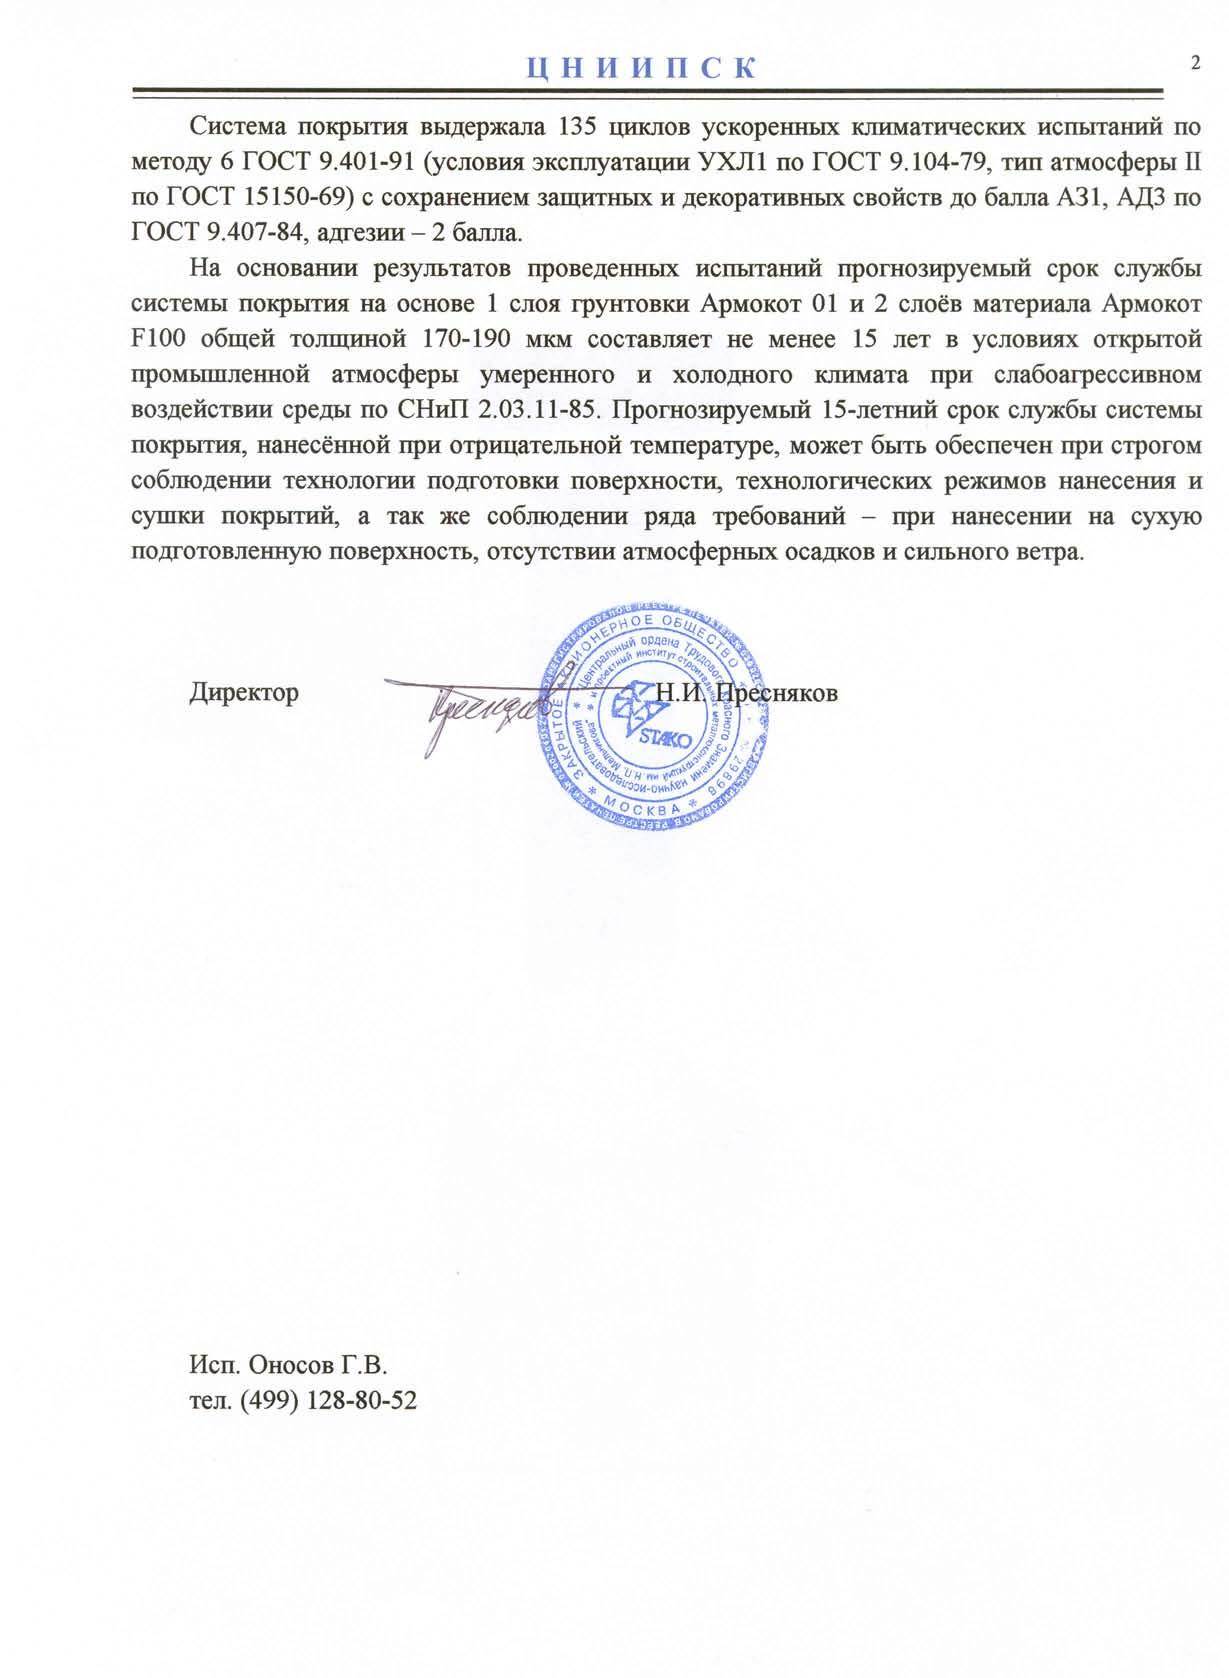 Заключение Армокот F100 минус_Страница_2